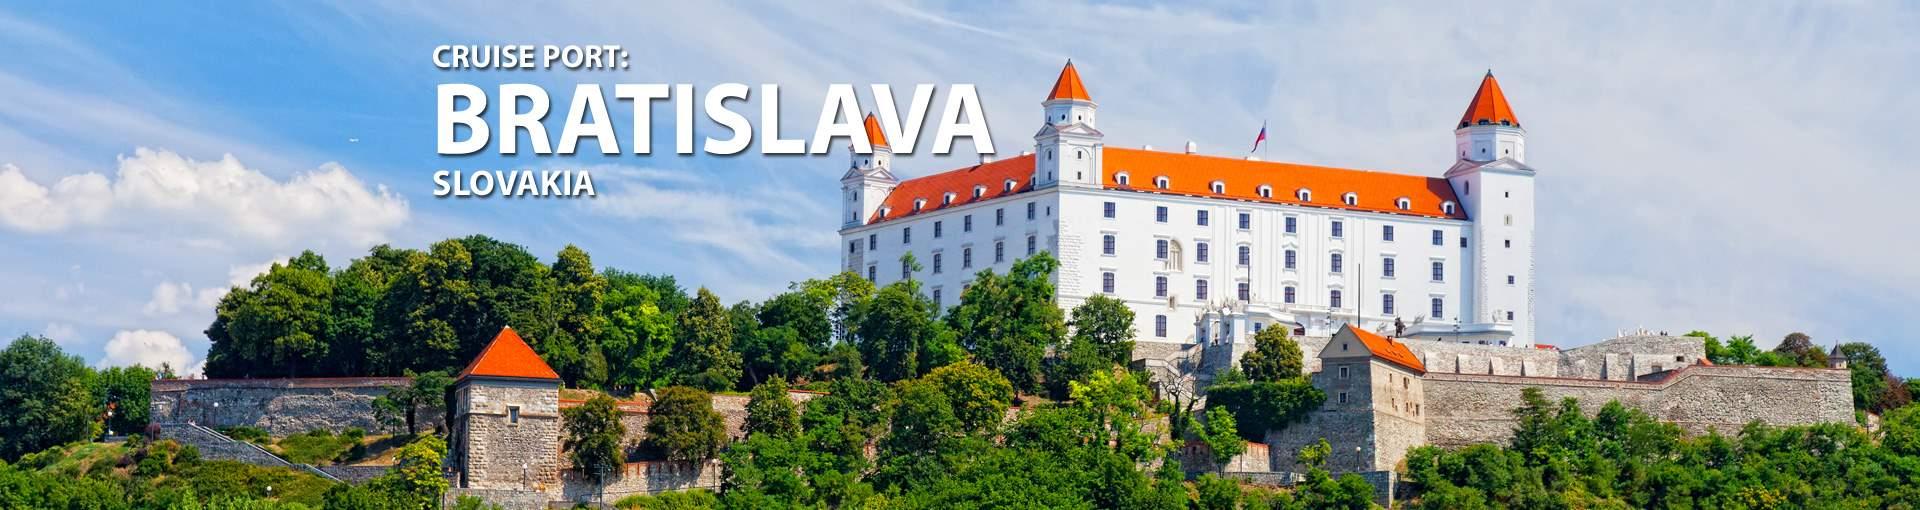 Cruises to Bratislava, Slovakia